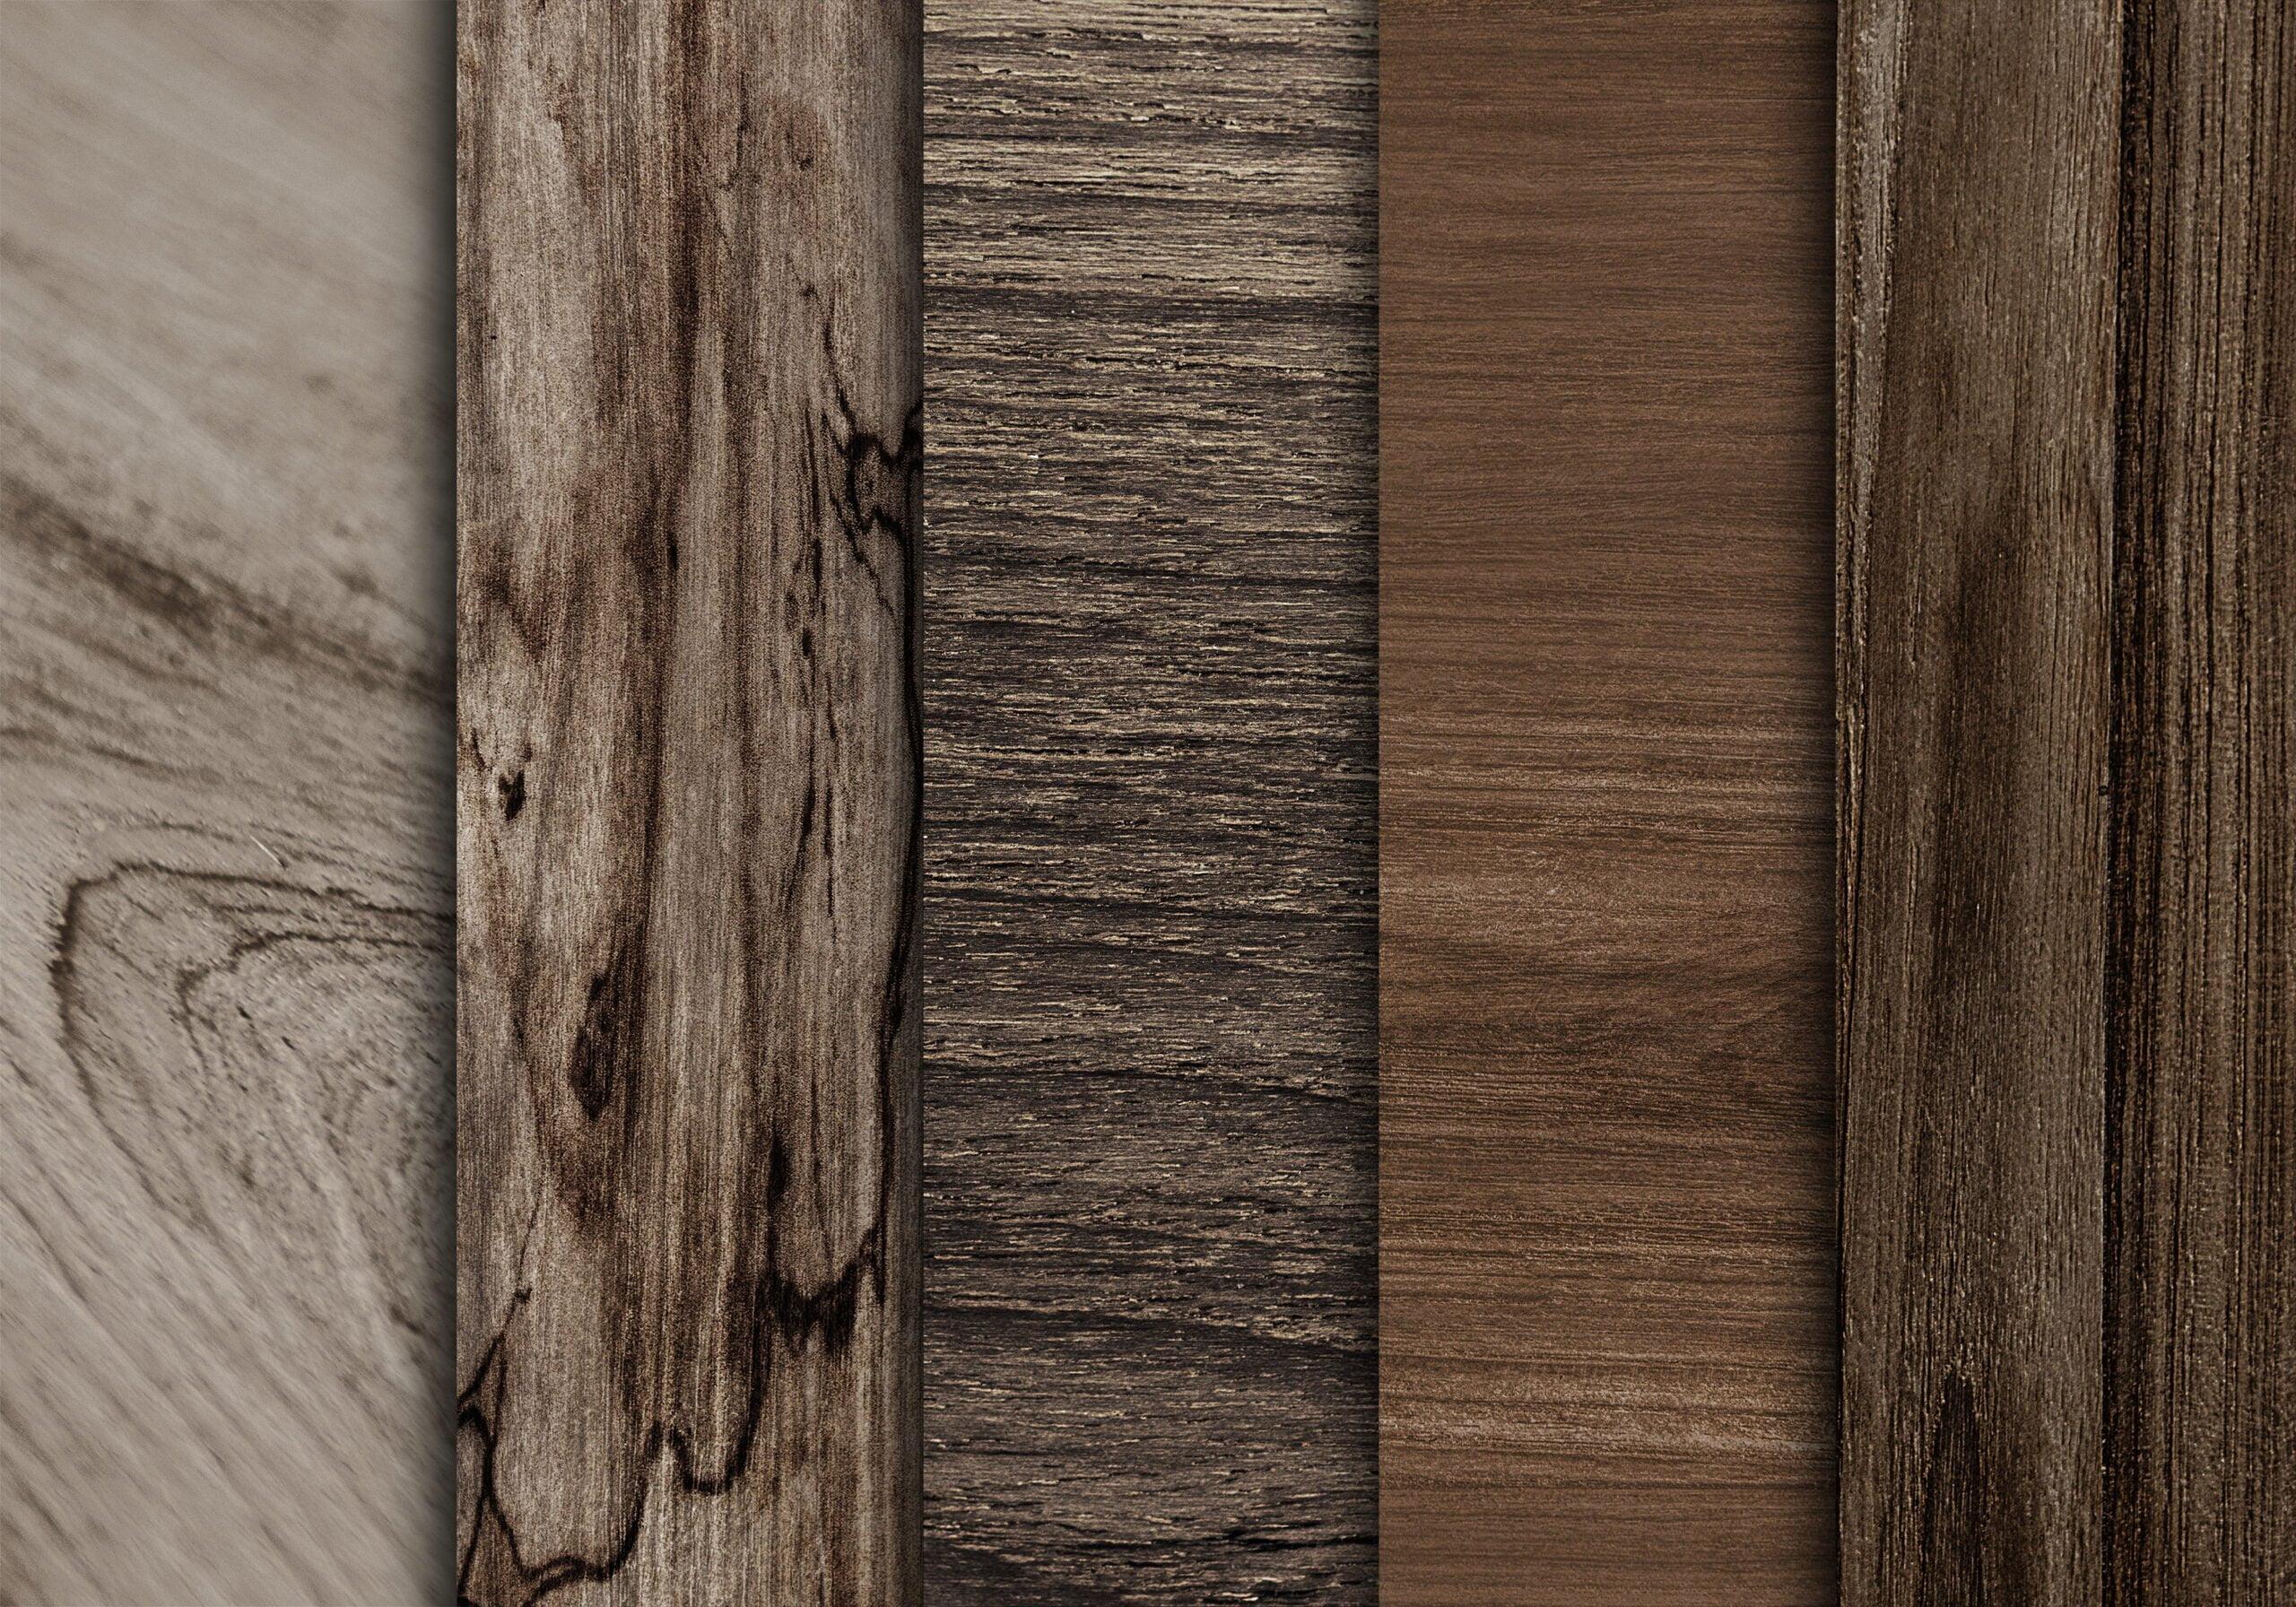 hardwood flooring samples of different dark wood patterns